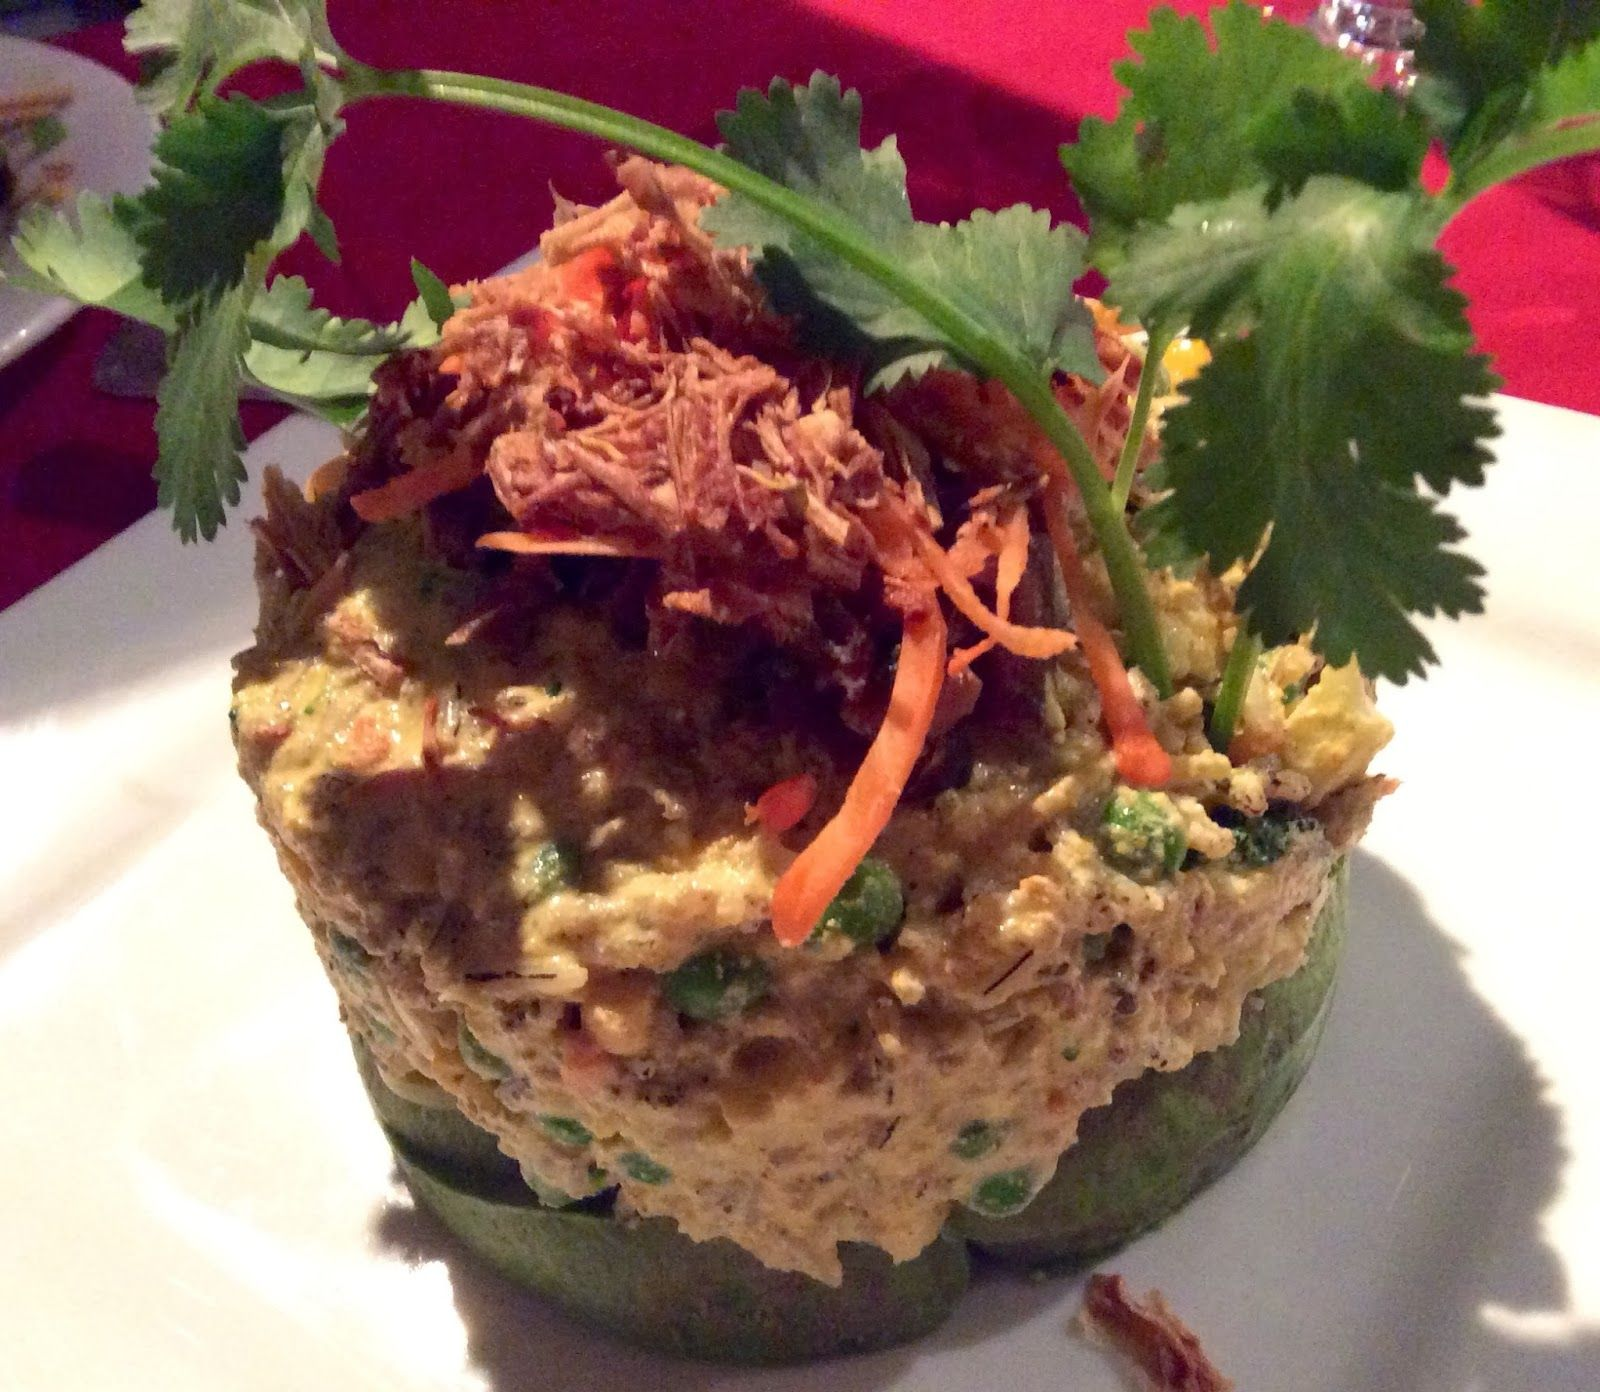 Raw food diet raw food recipes vegan recipes health wellness blog raw food diet raw food recipes vegan recipes health wellness blog natural healing green eco forumfinder Gallery